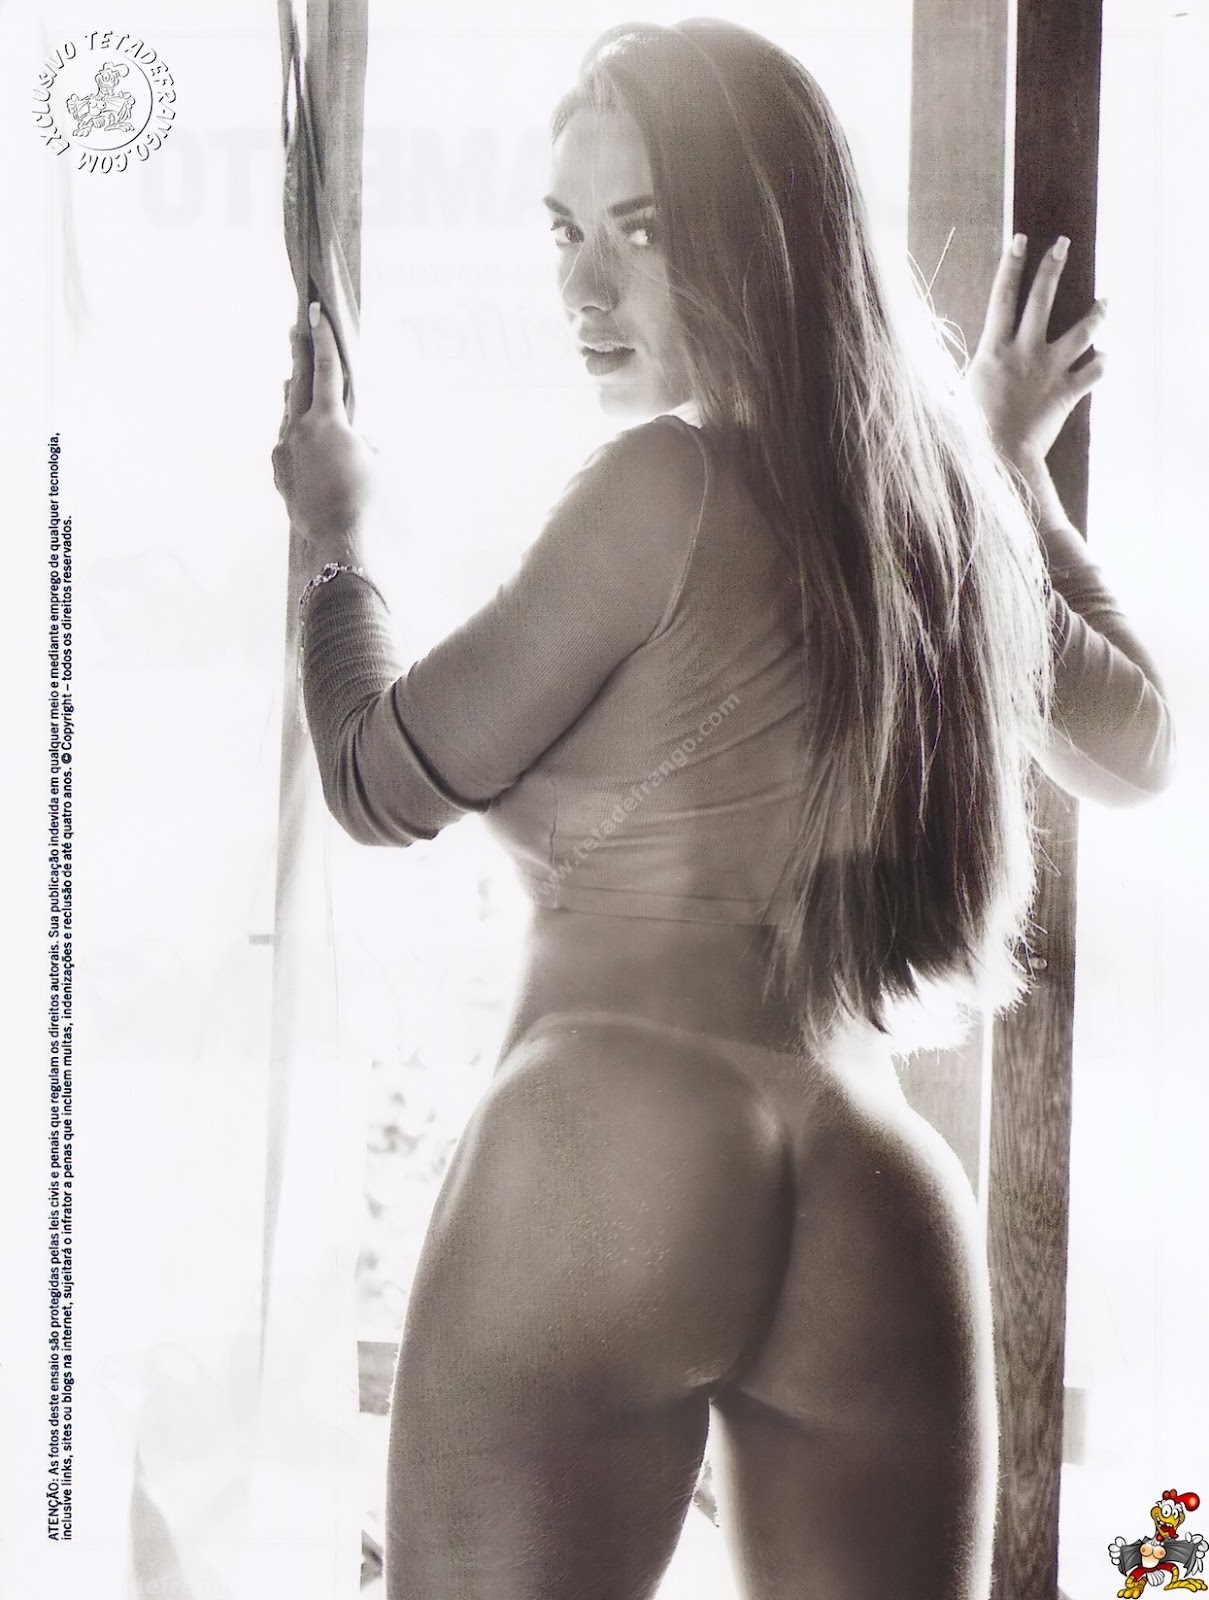 Revista Playboy Capa As Mulheres Do Mundo Maria Melillo